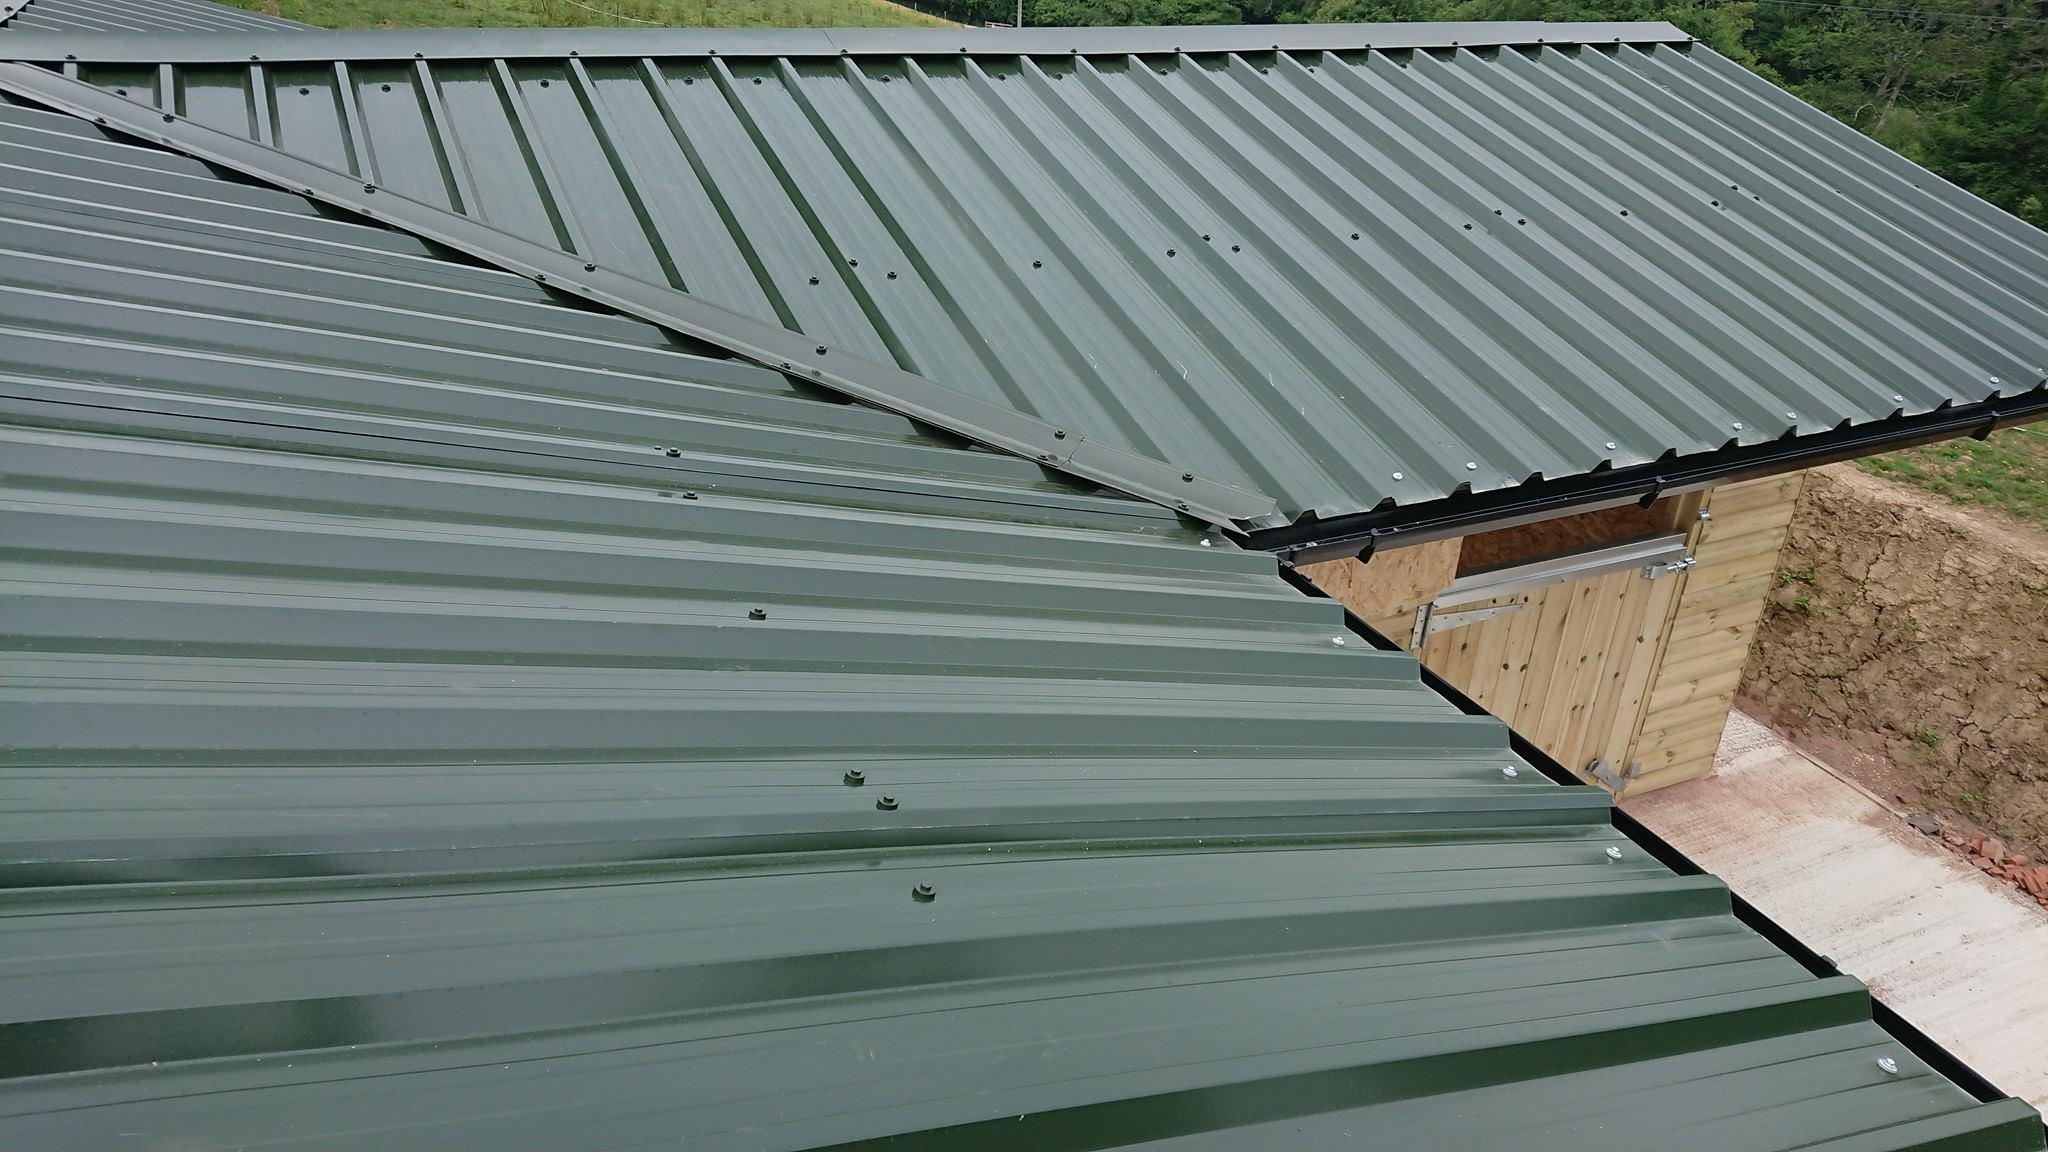 Box Profile 32/1000 Juniper Green Roofing Sheets